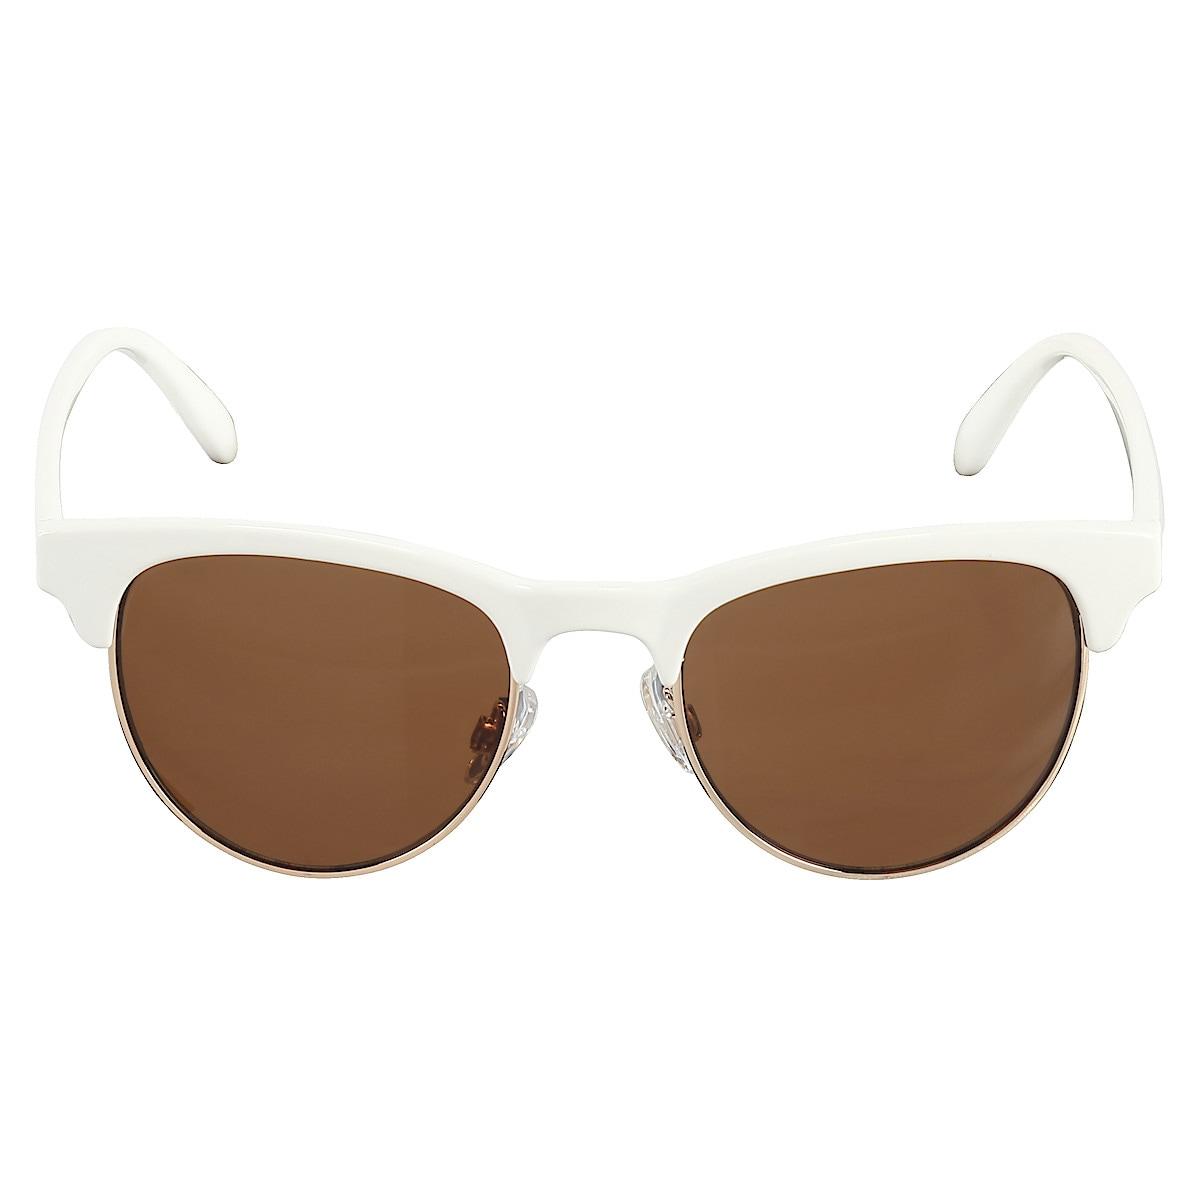 Plastic/Metal Sunglasses